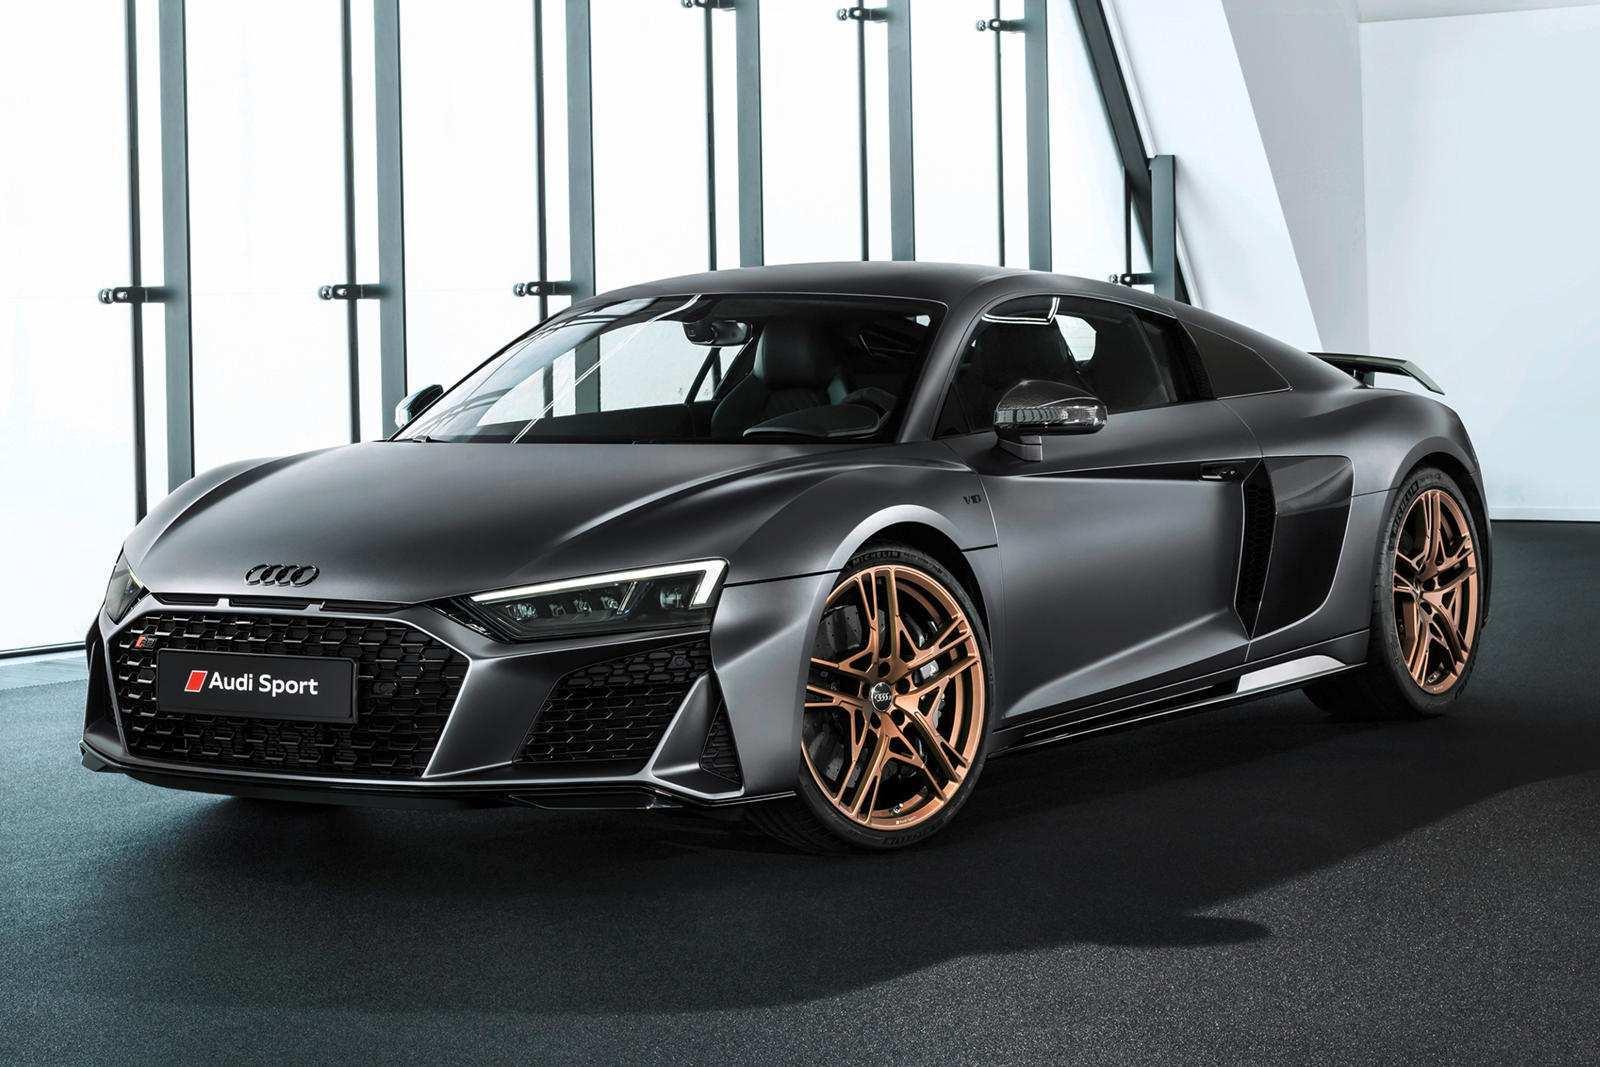 69 All New Audi F1 2020 Configurations for Audi F1 2020